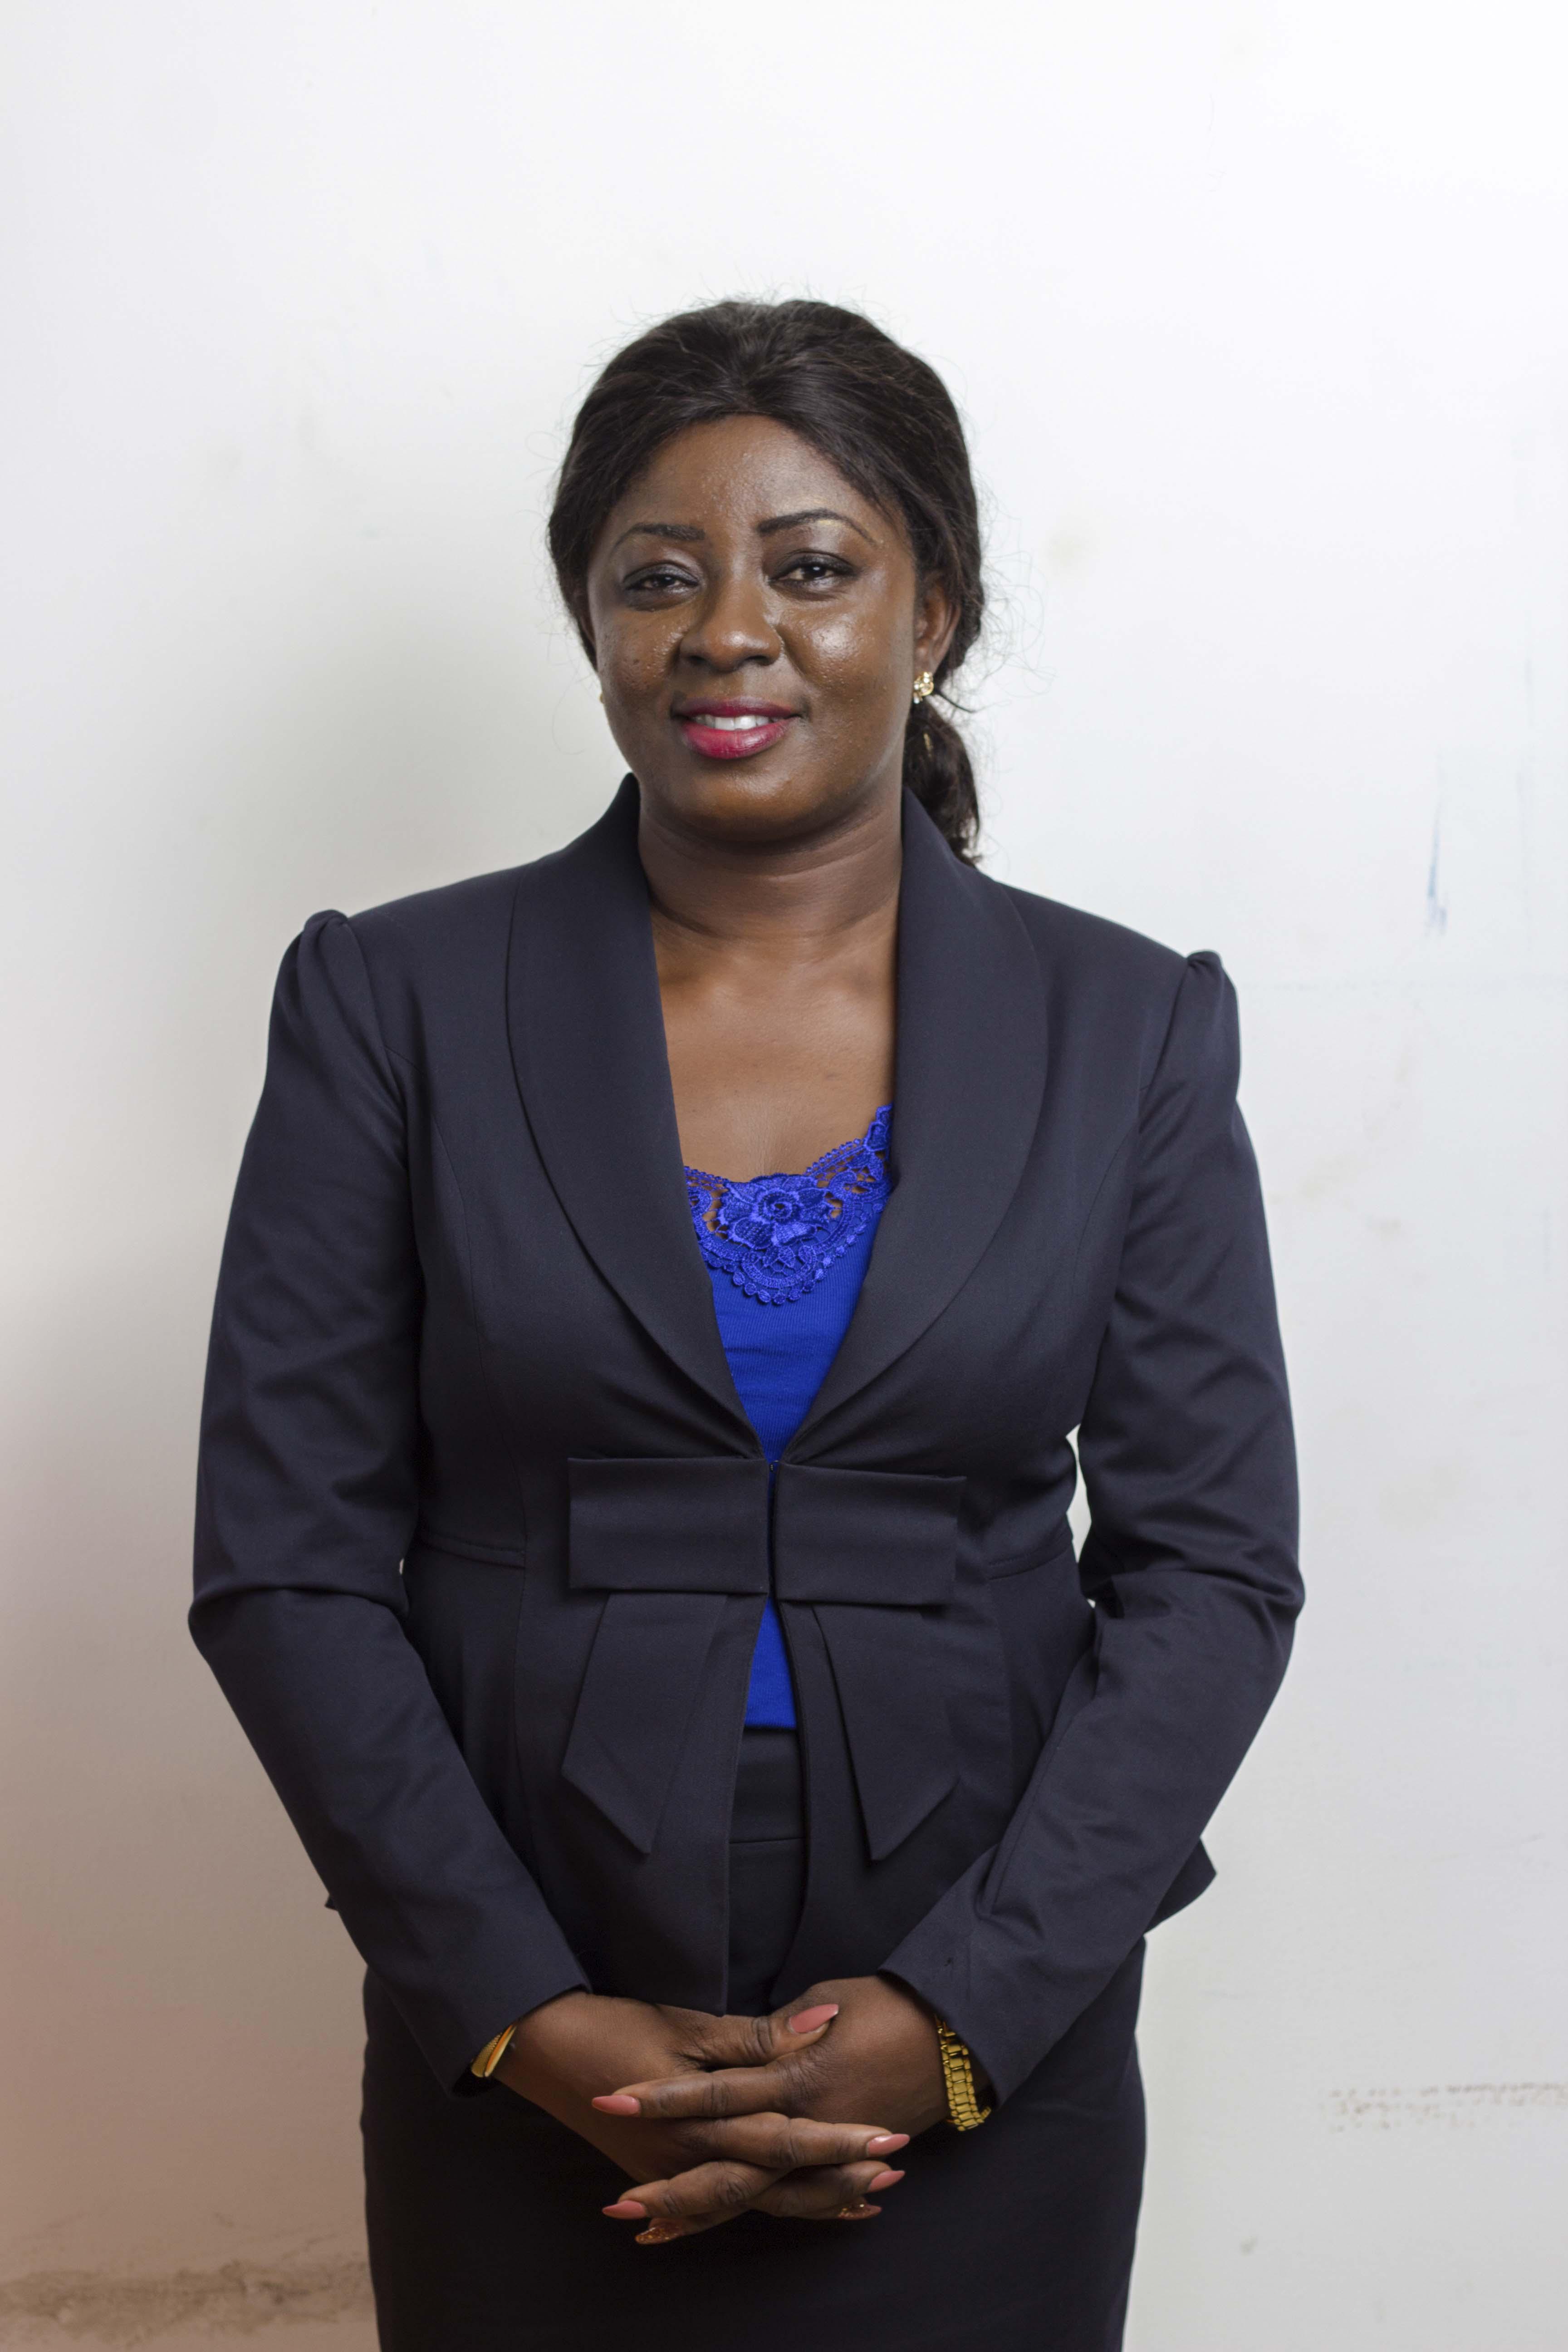 Thelma Baba Acquah